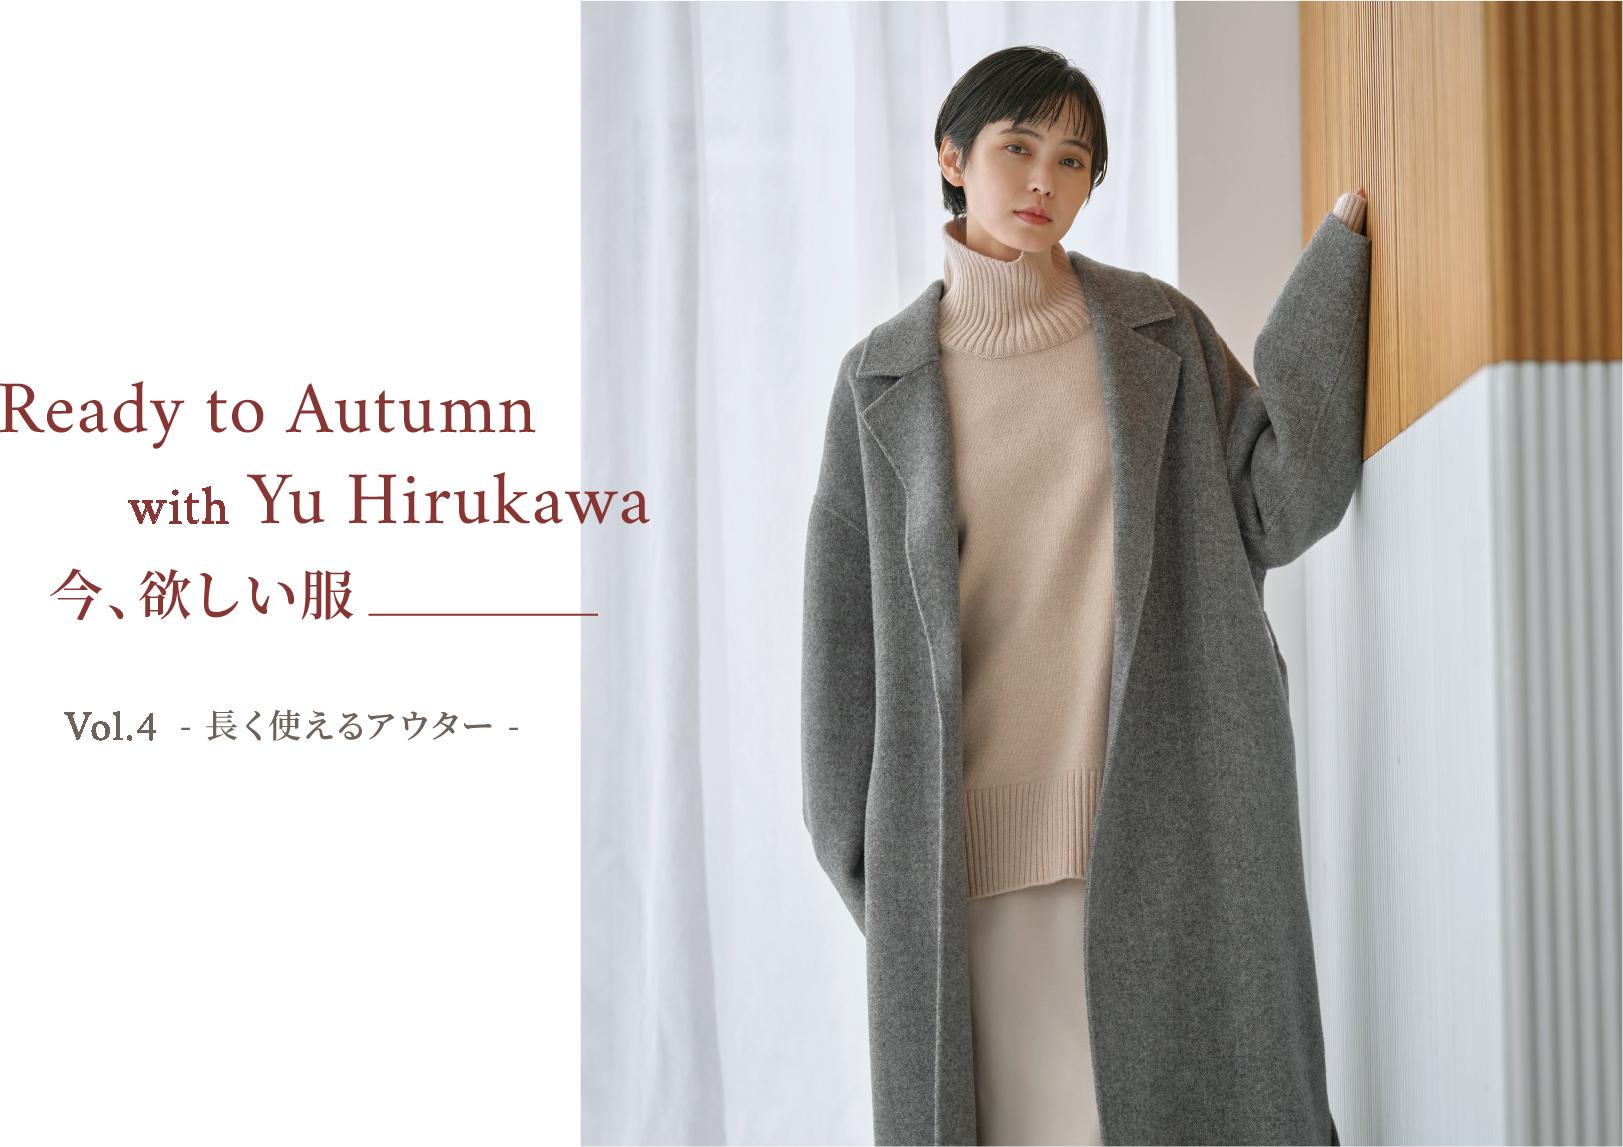 Ready to Autumn with Yu Hirukawa 今、欲しい服 Vol.4 - 長く使えるアウター -